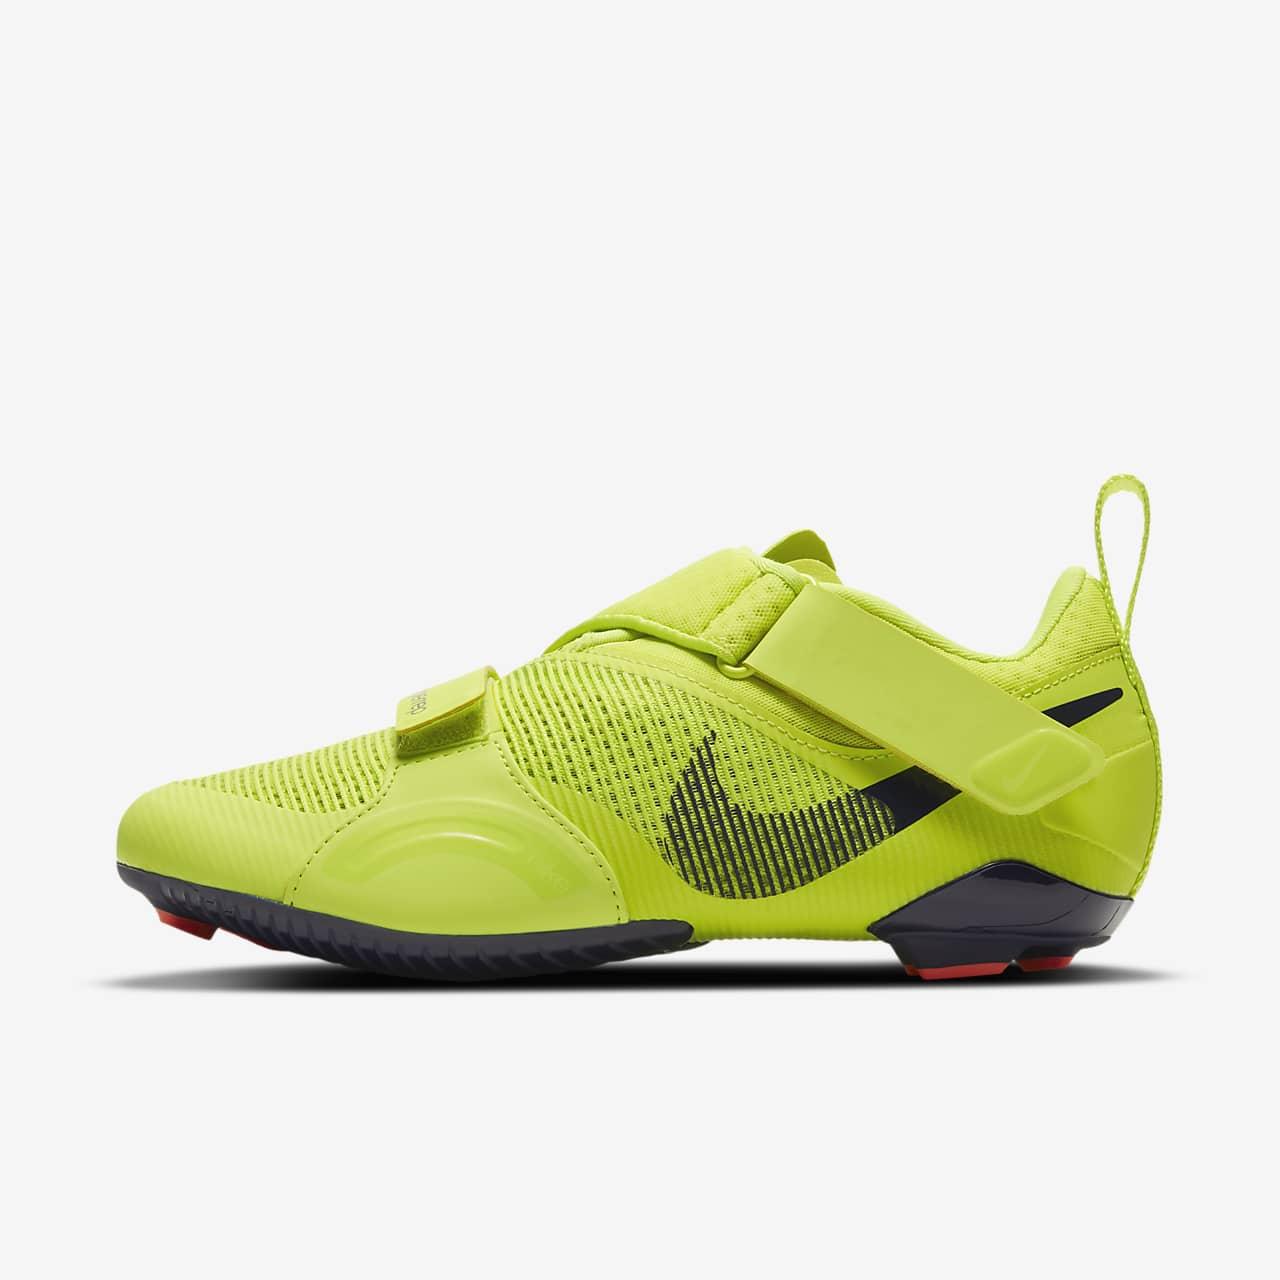 Nike SuperRep Cycle Women's Indoor Cycling Shoe